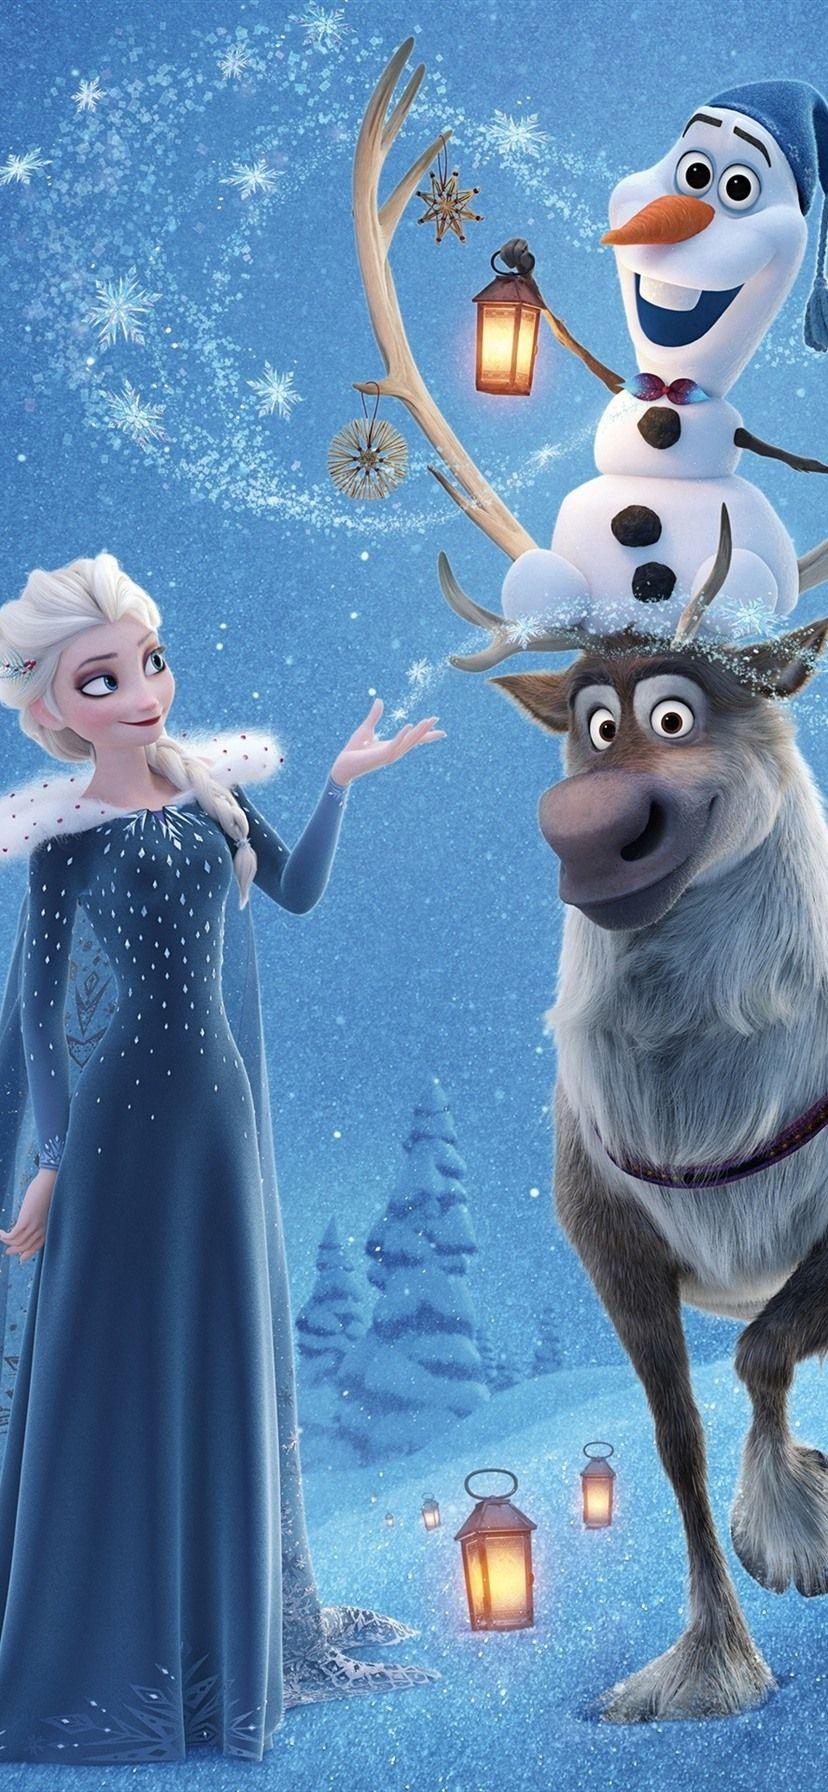 Beautiful Olaf Frozen 2 Wallpaper Iphone Wallpaper Frozen 2 Wallpaper Frozen Pictures Frozen Wallpaper